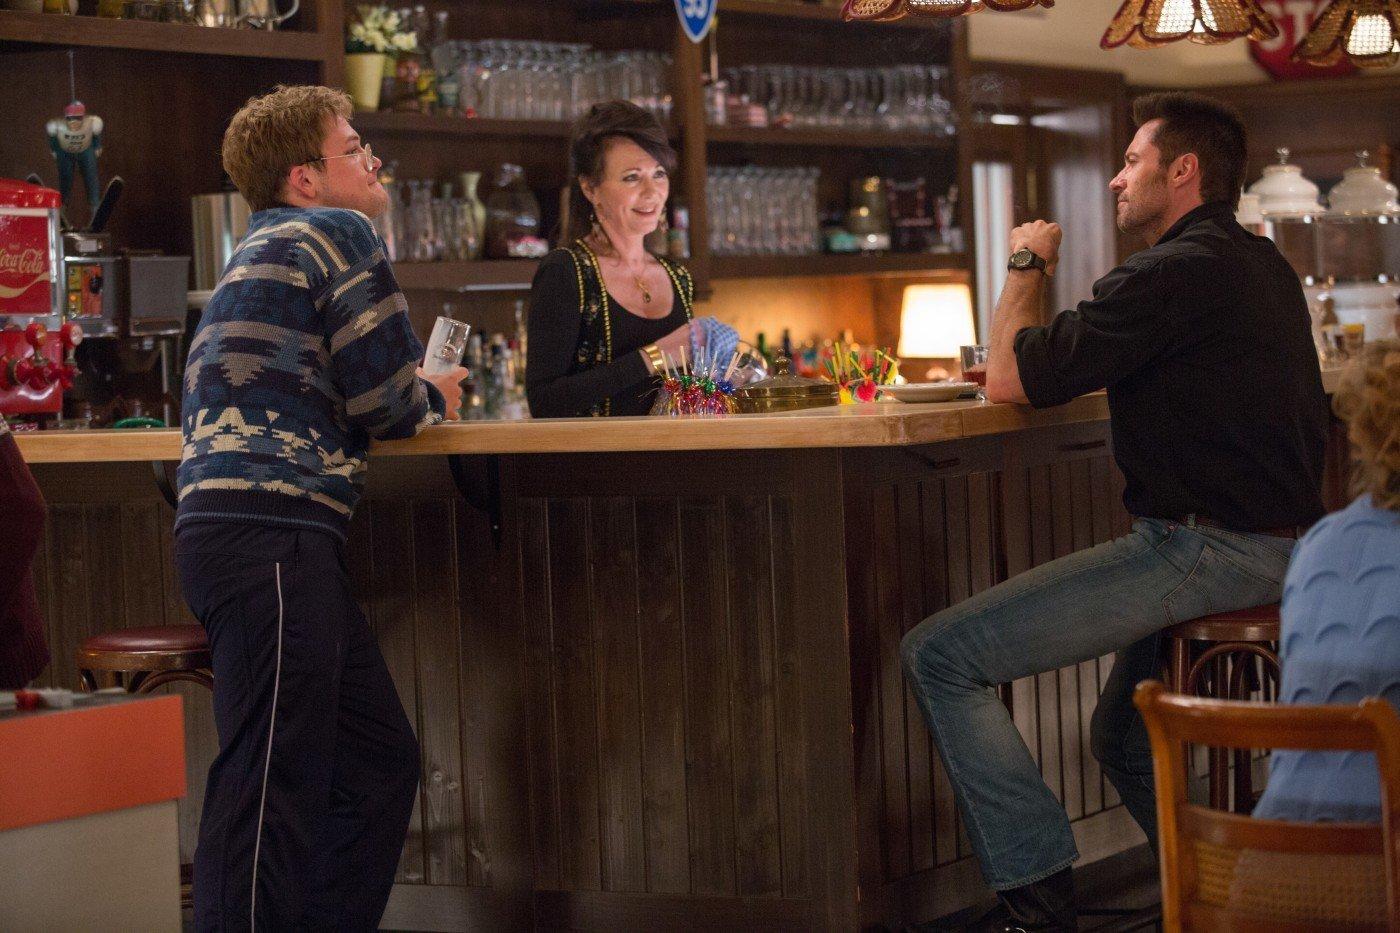 Iris Berben, Hugh Jackman, and Taron Egerton in Eddie the Eagle (2015)